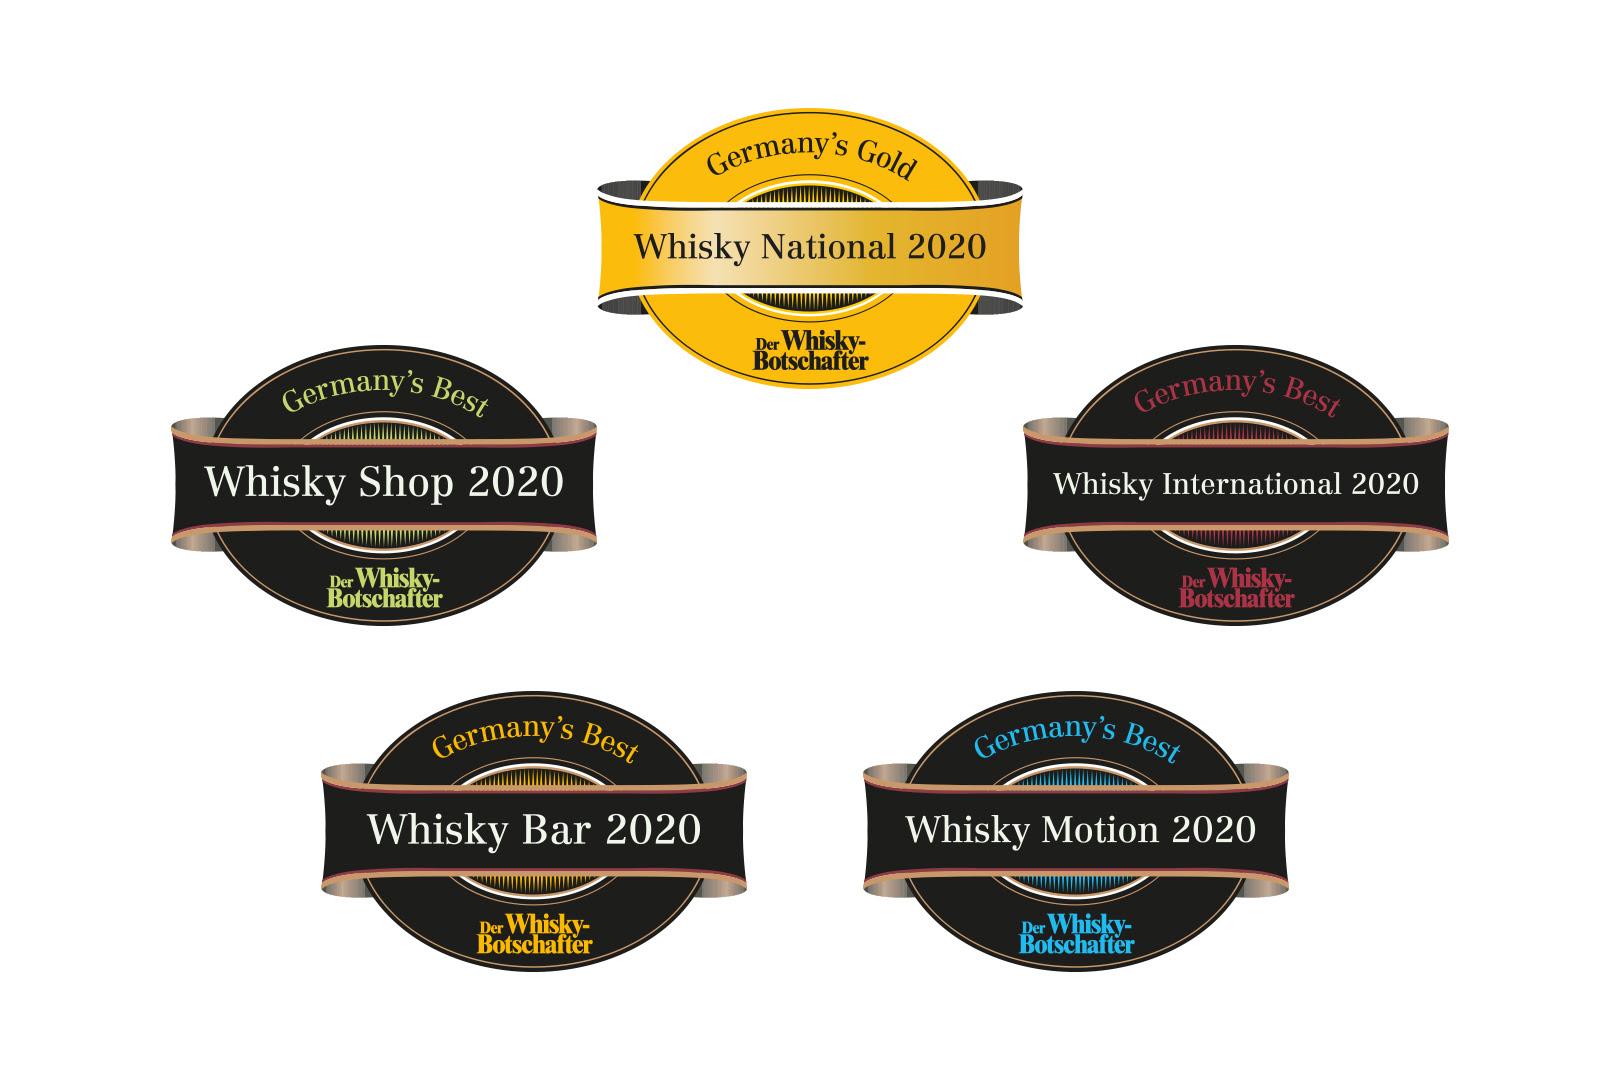 Germanys Best Whisky Award 2020